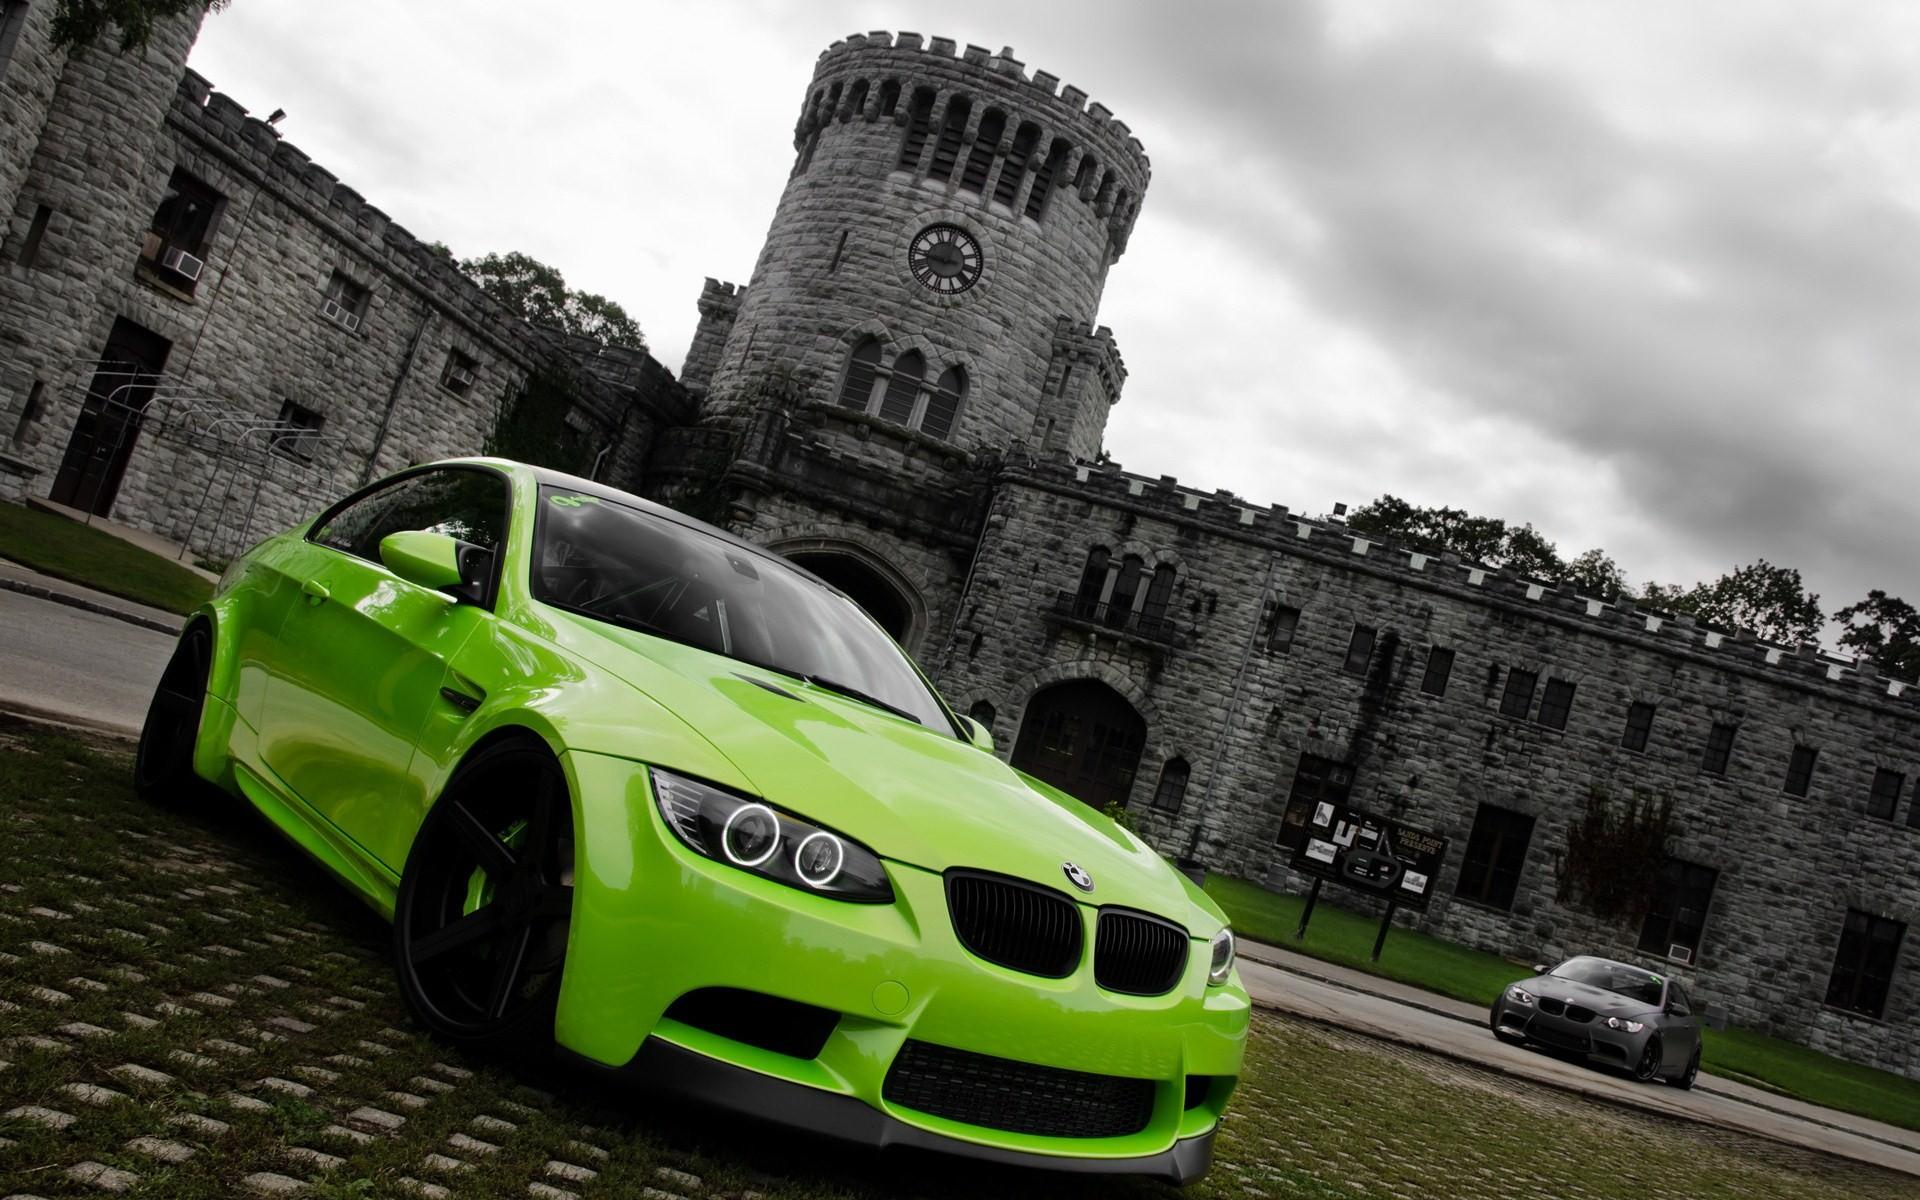 Bmw Green Car Green Cars Gray Bmw m3 Green